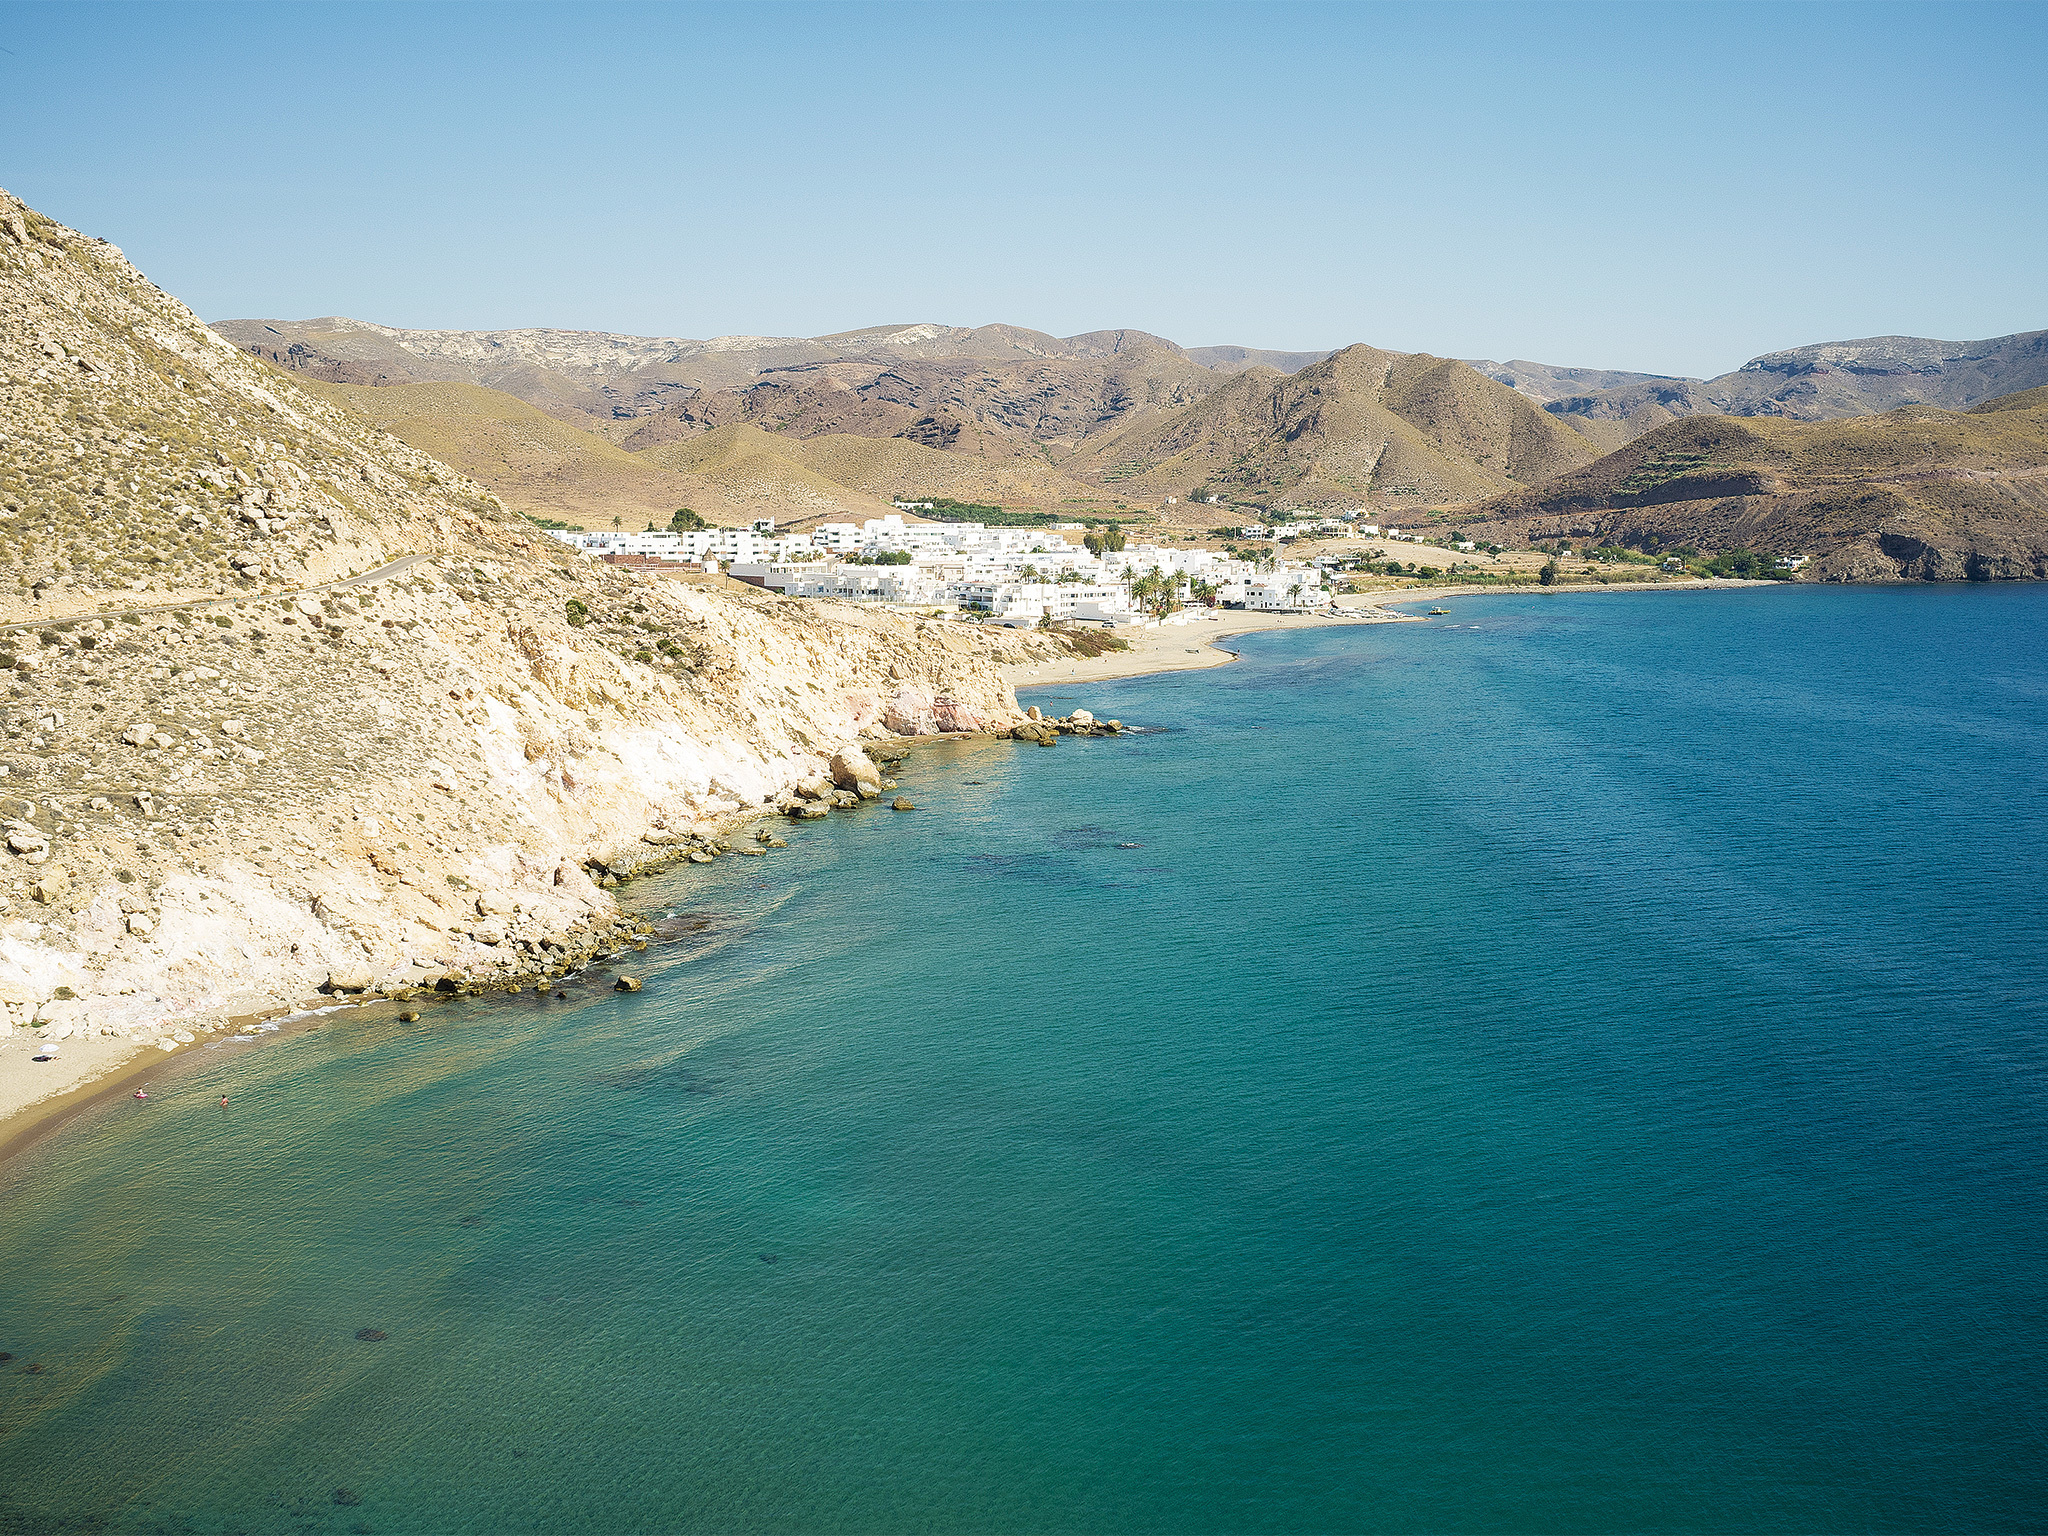 Las Negras, Cabo de Gata, Almeria.